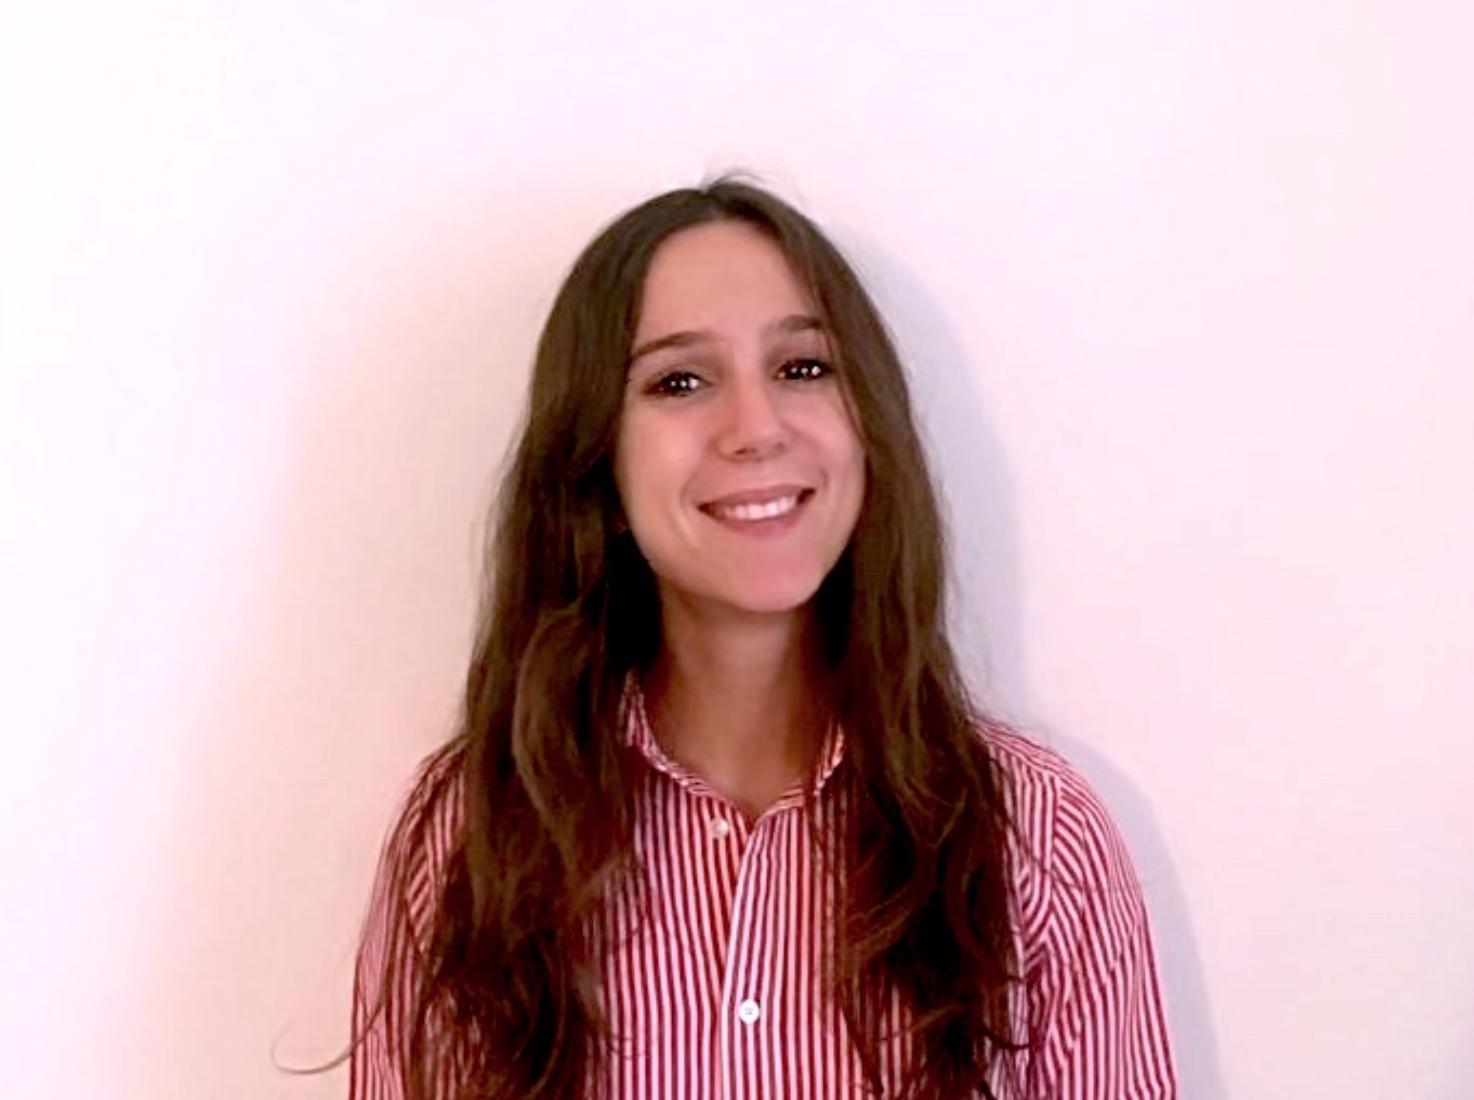 Isabella Guelfi Camaiani